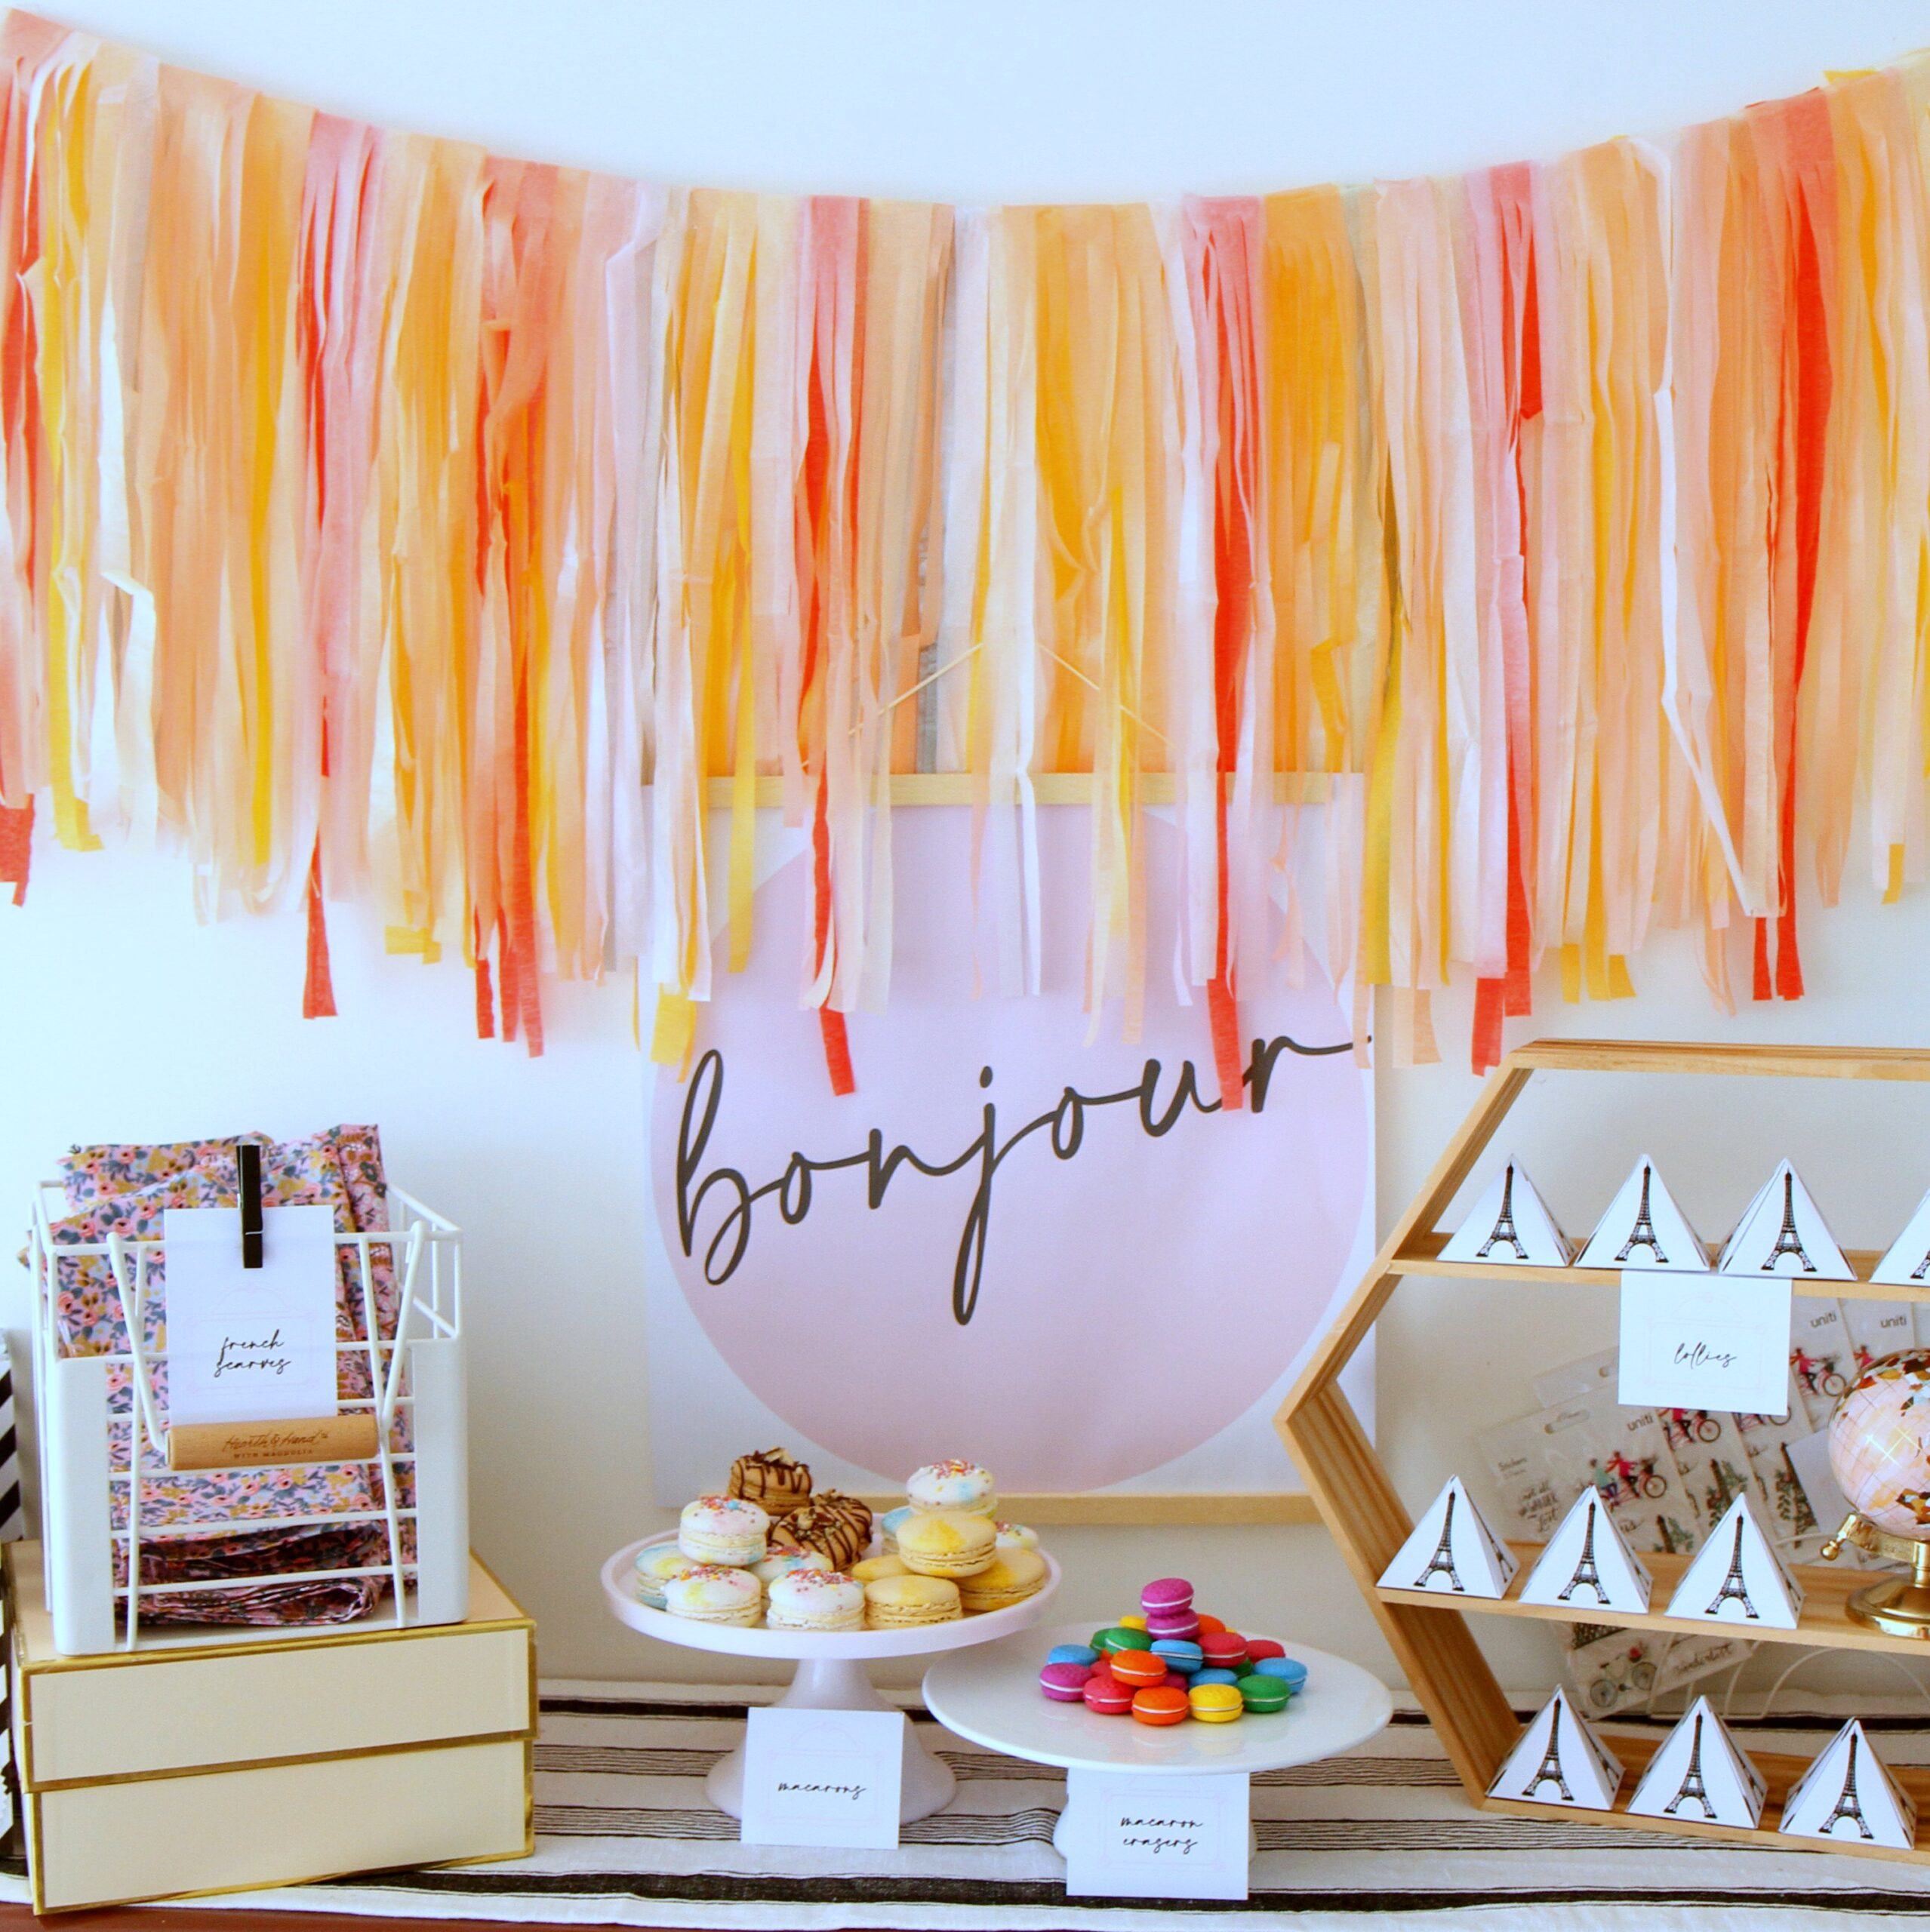 paris birthday party ideas